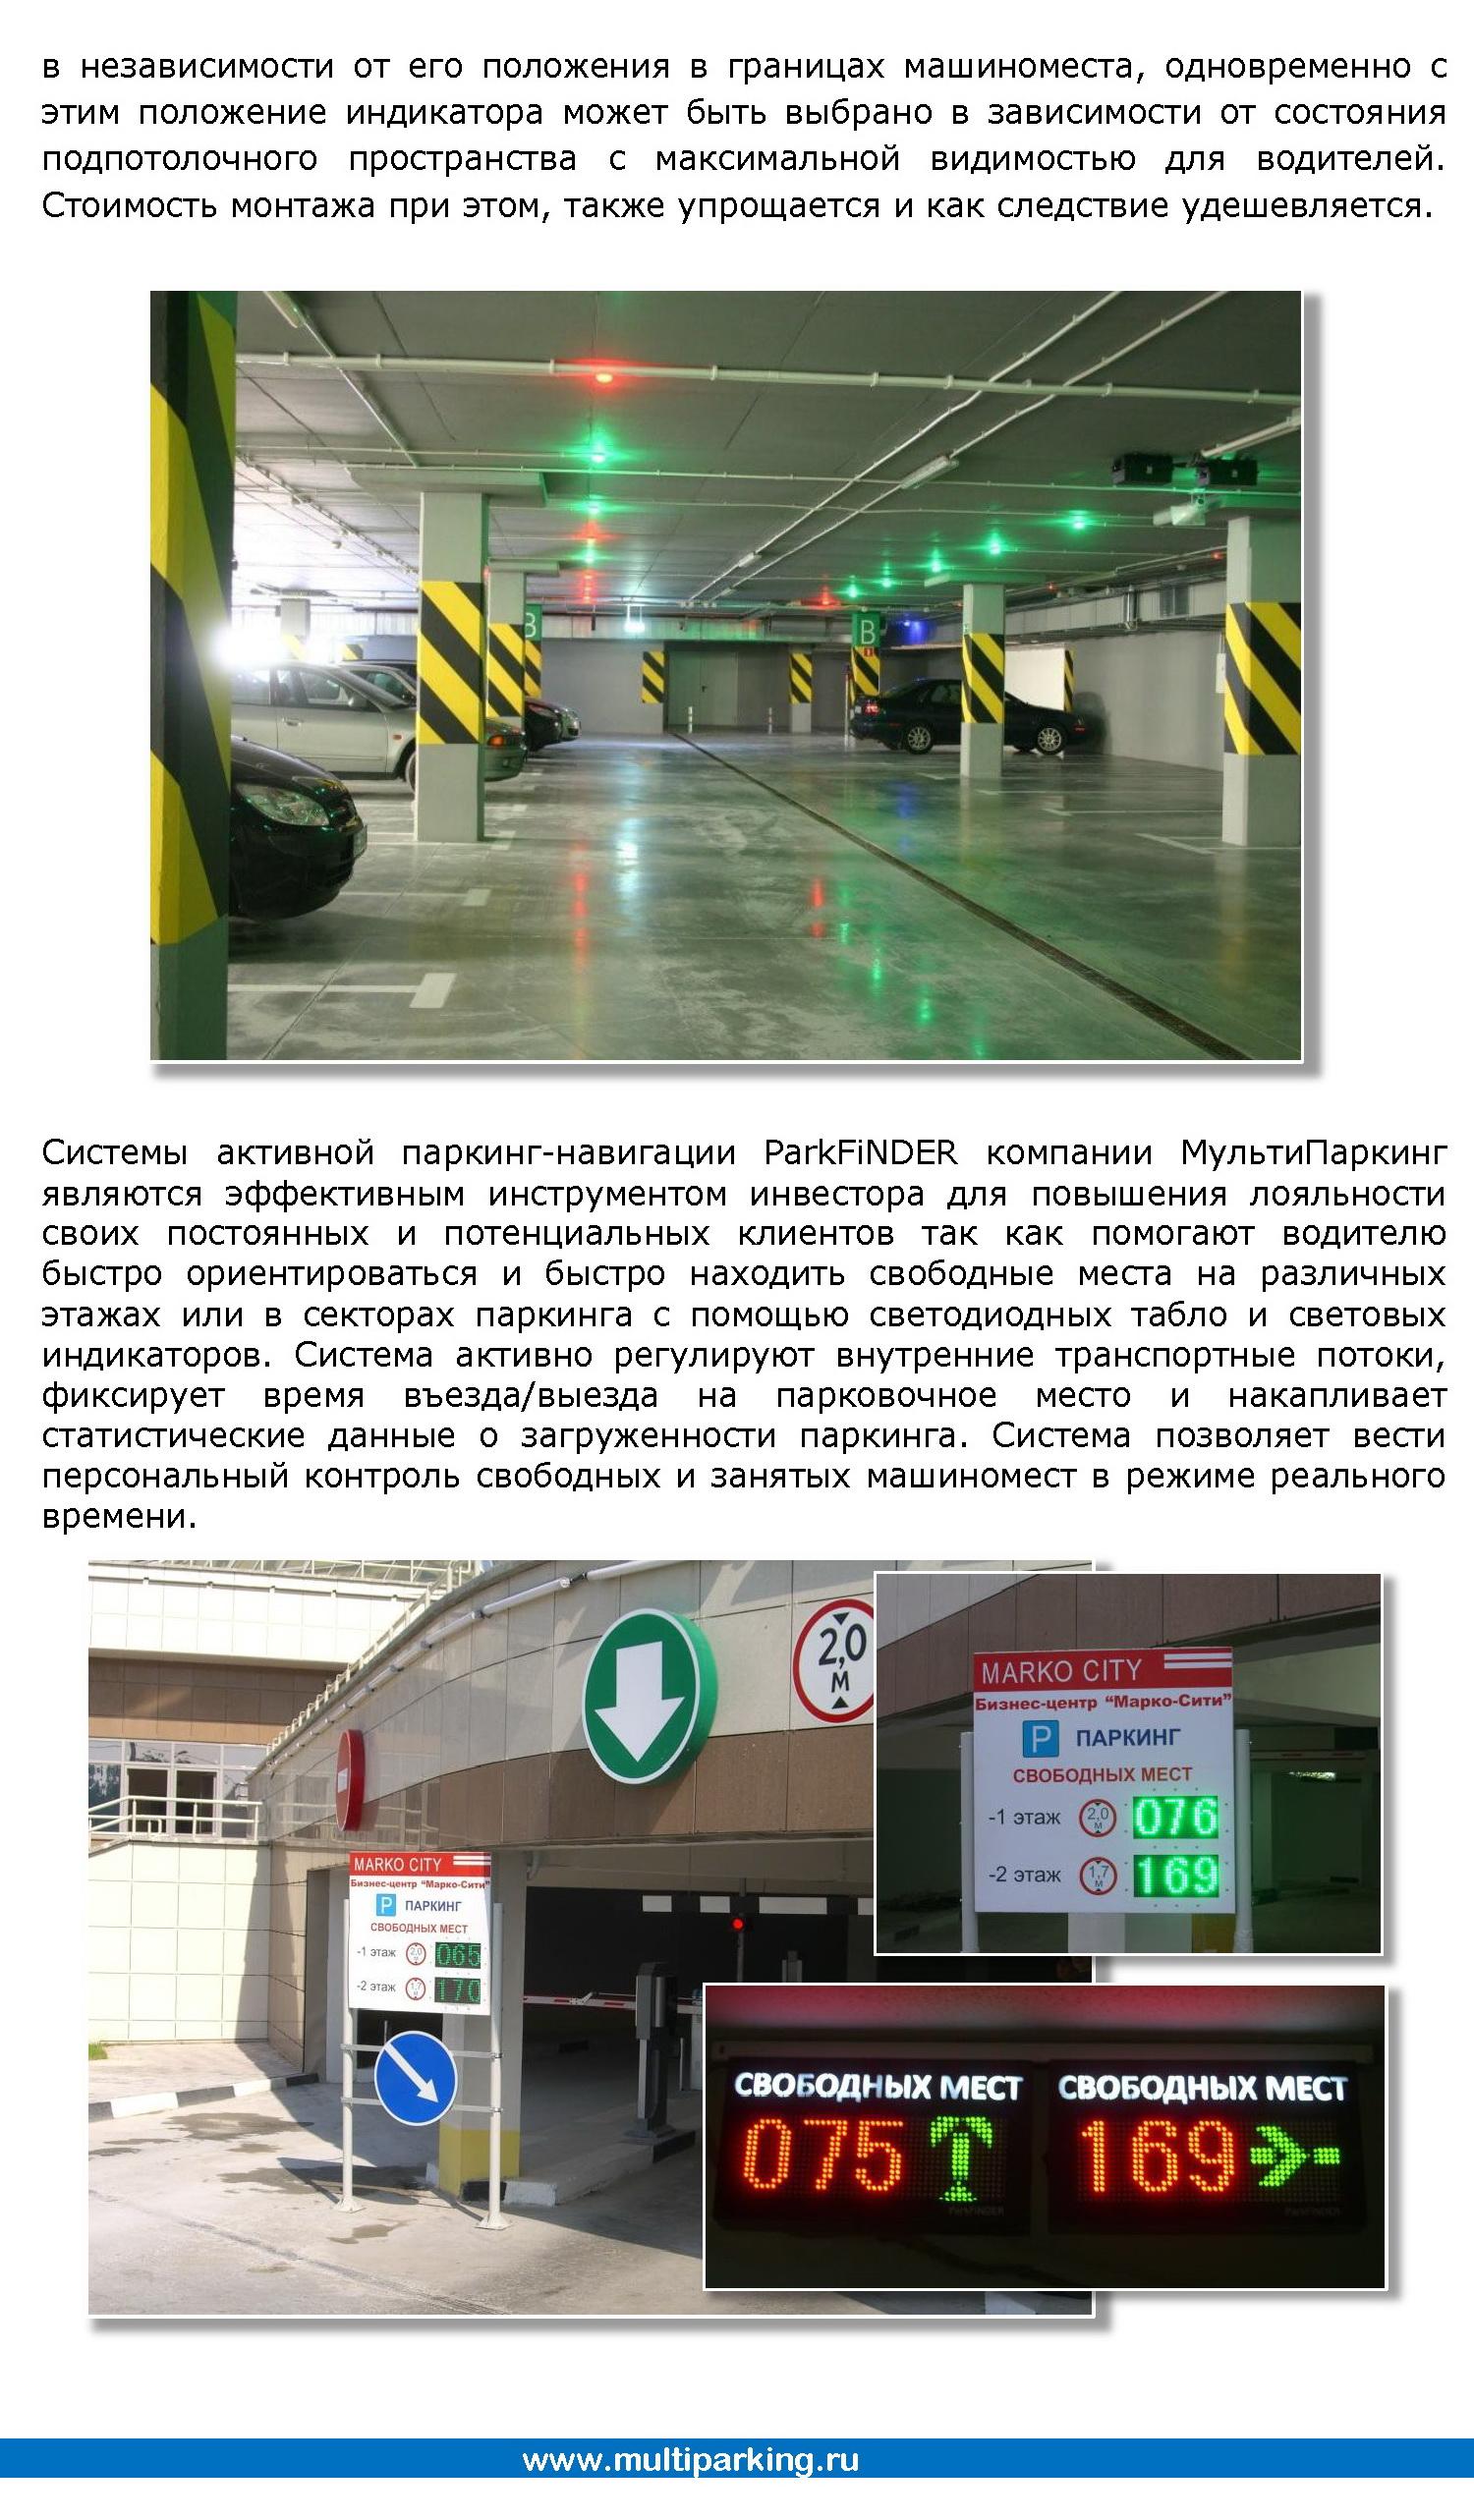 Сравнение УЗД_2013-10-01_Страница_3s